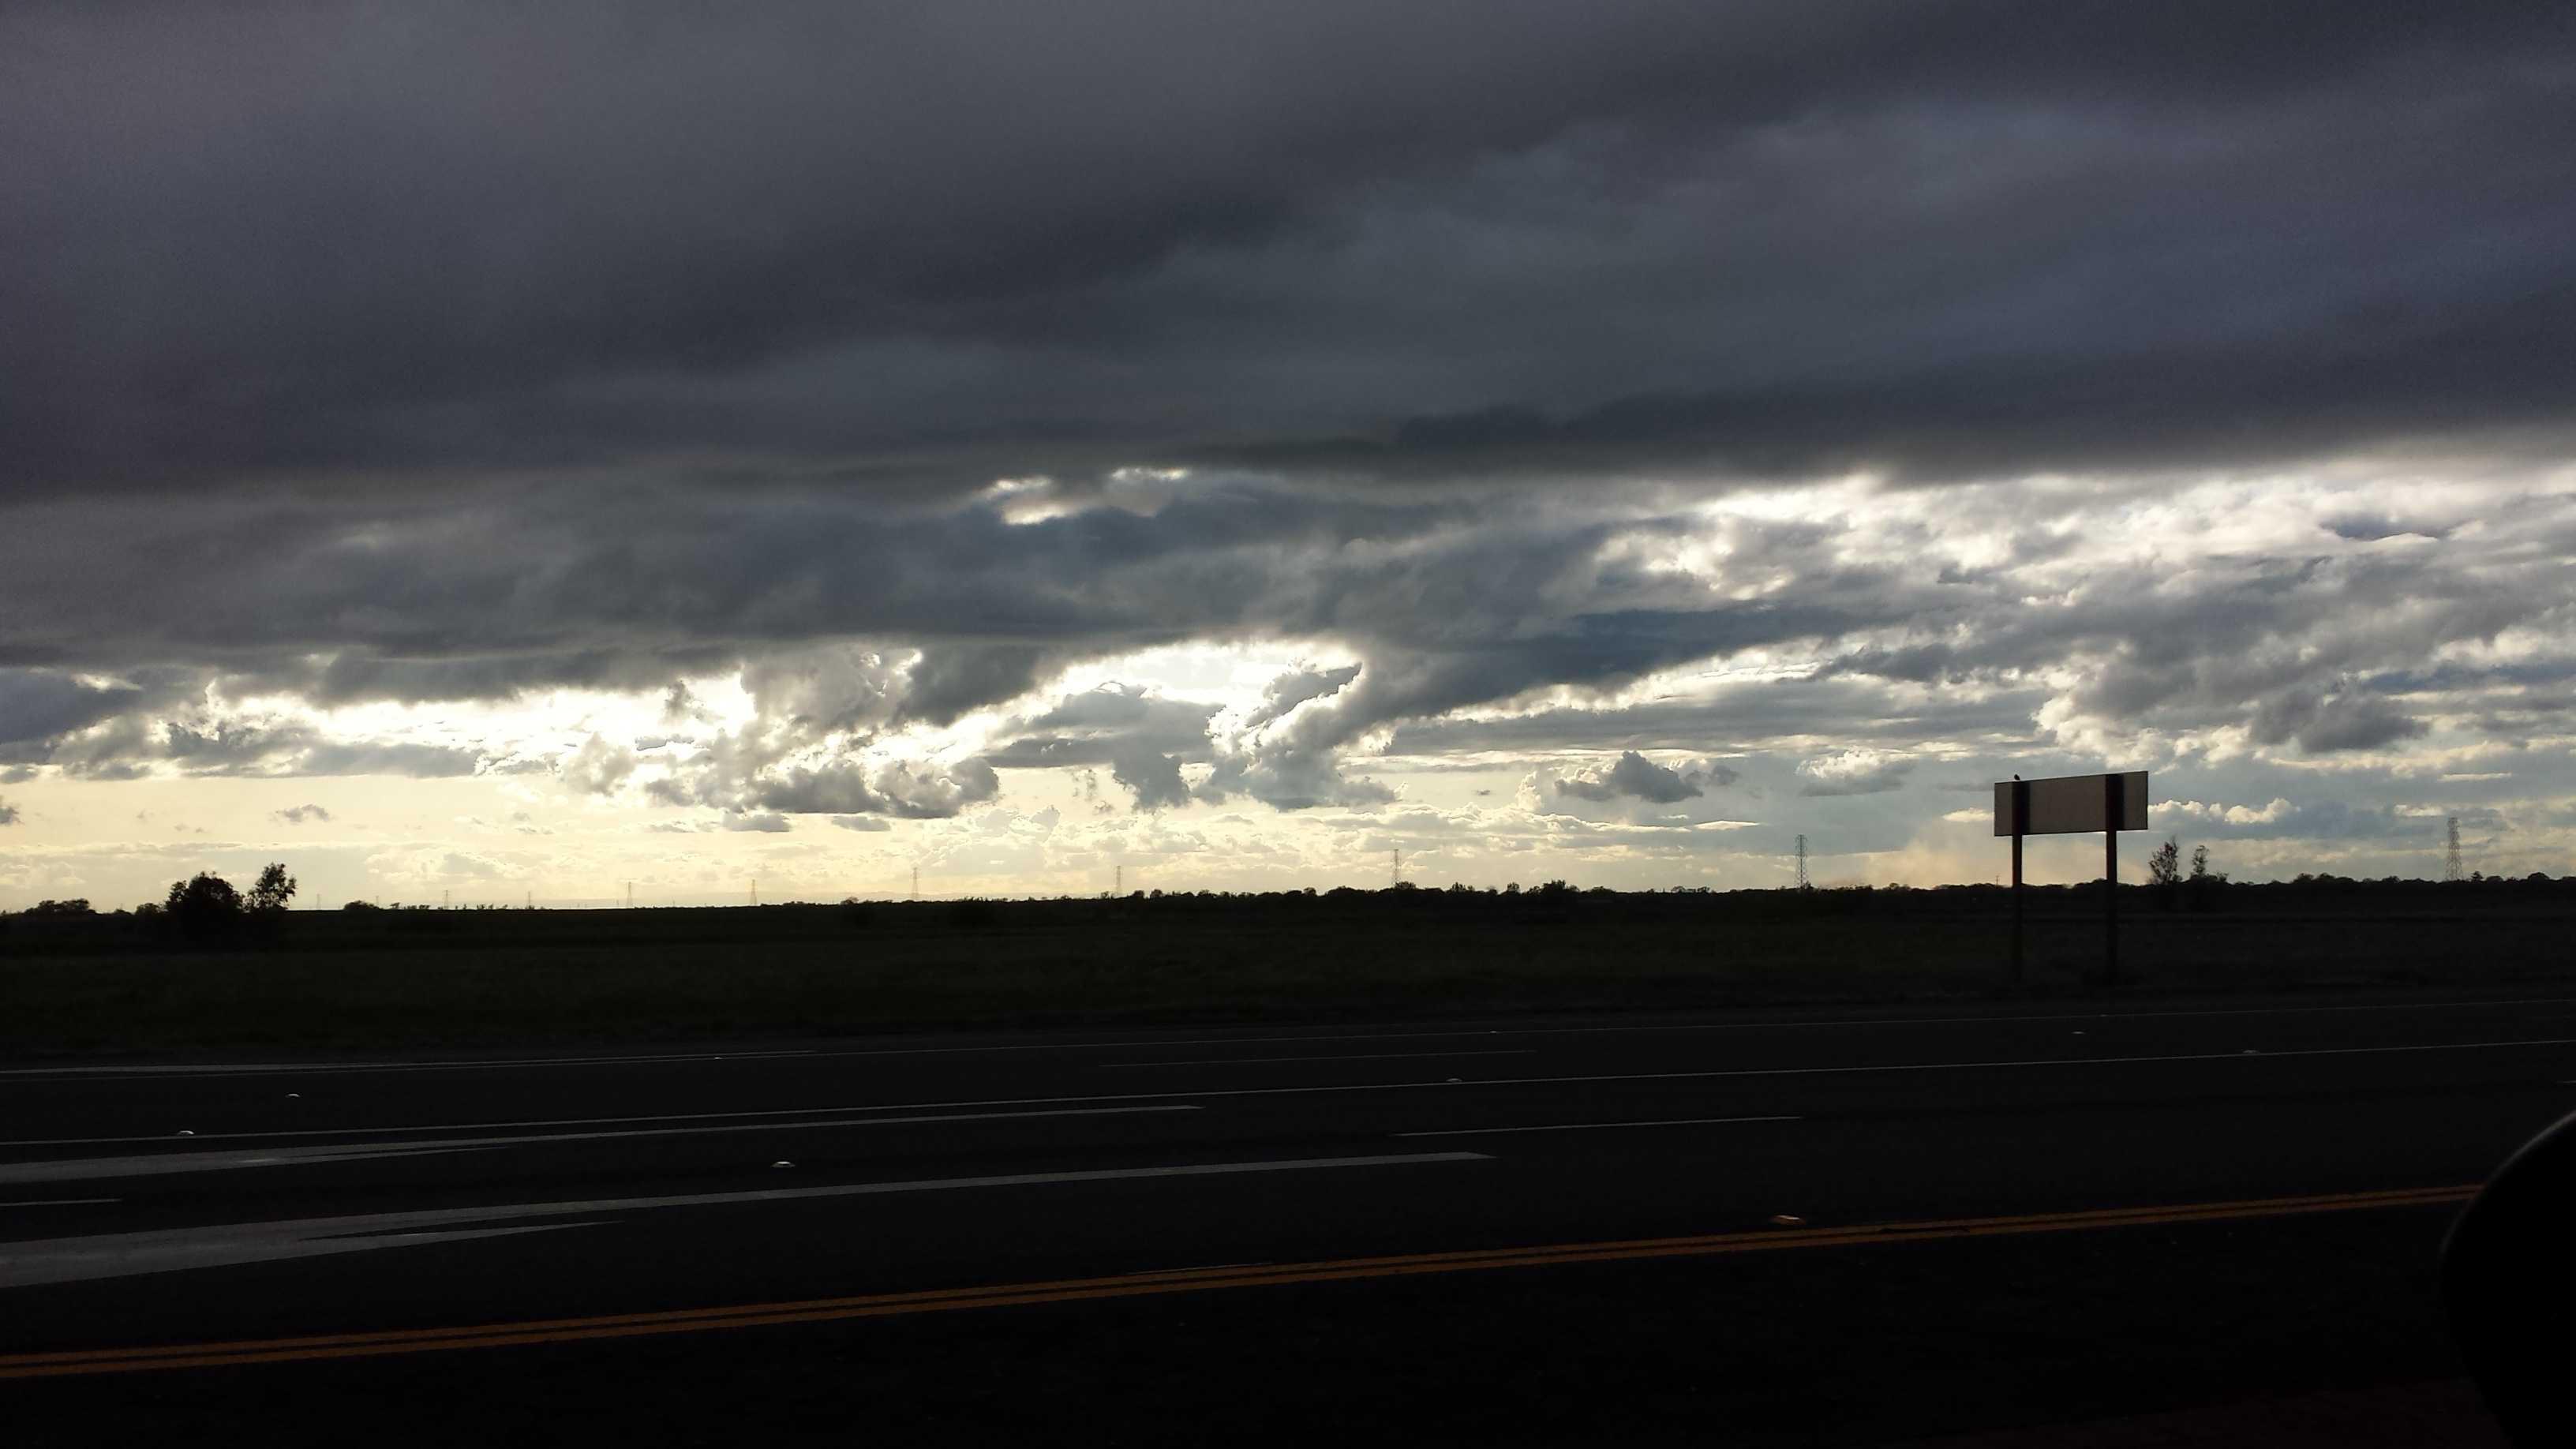 Wheatland storm clouds